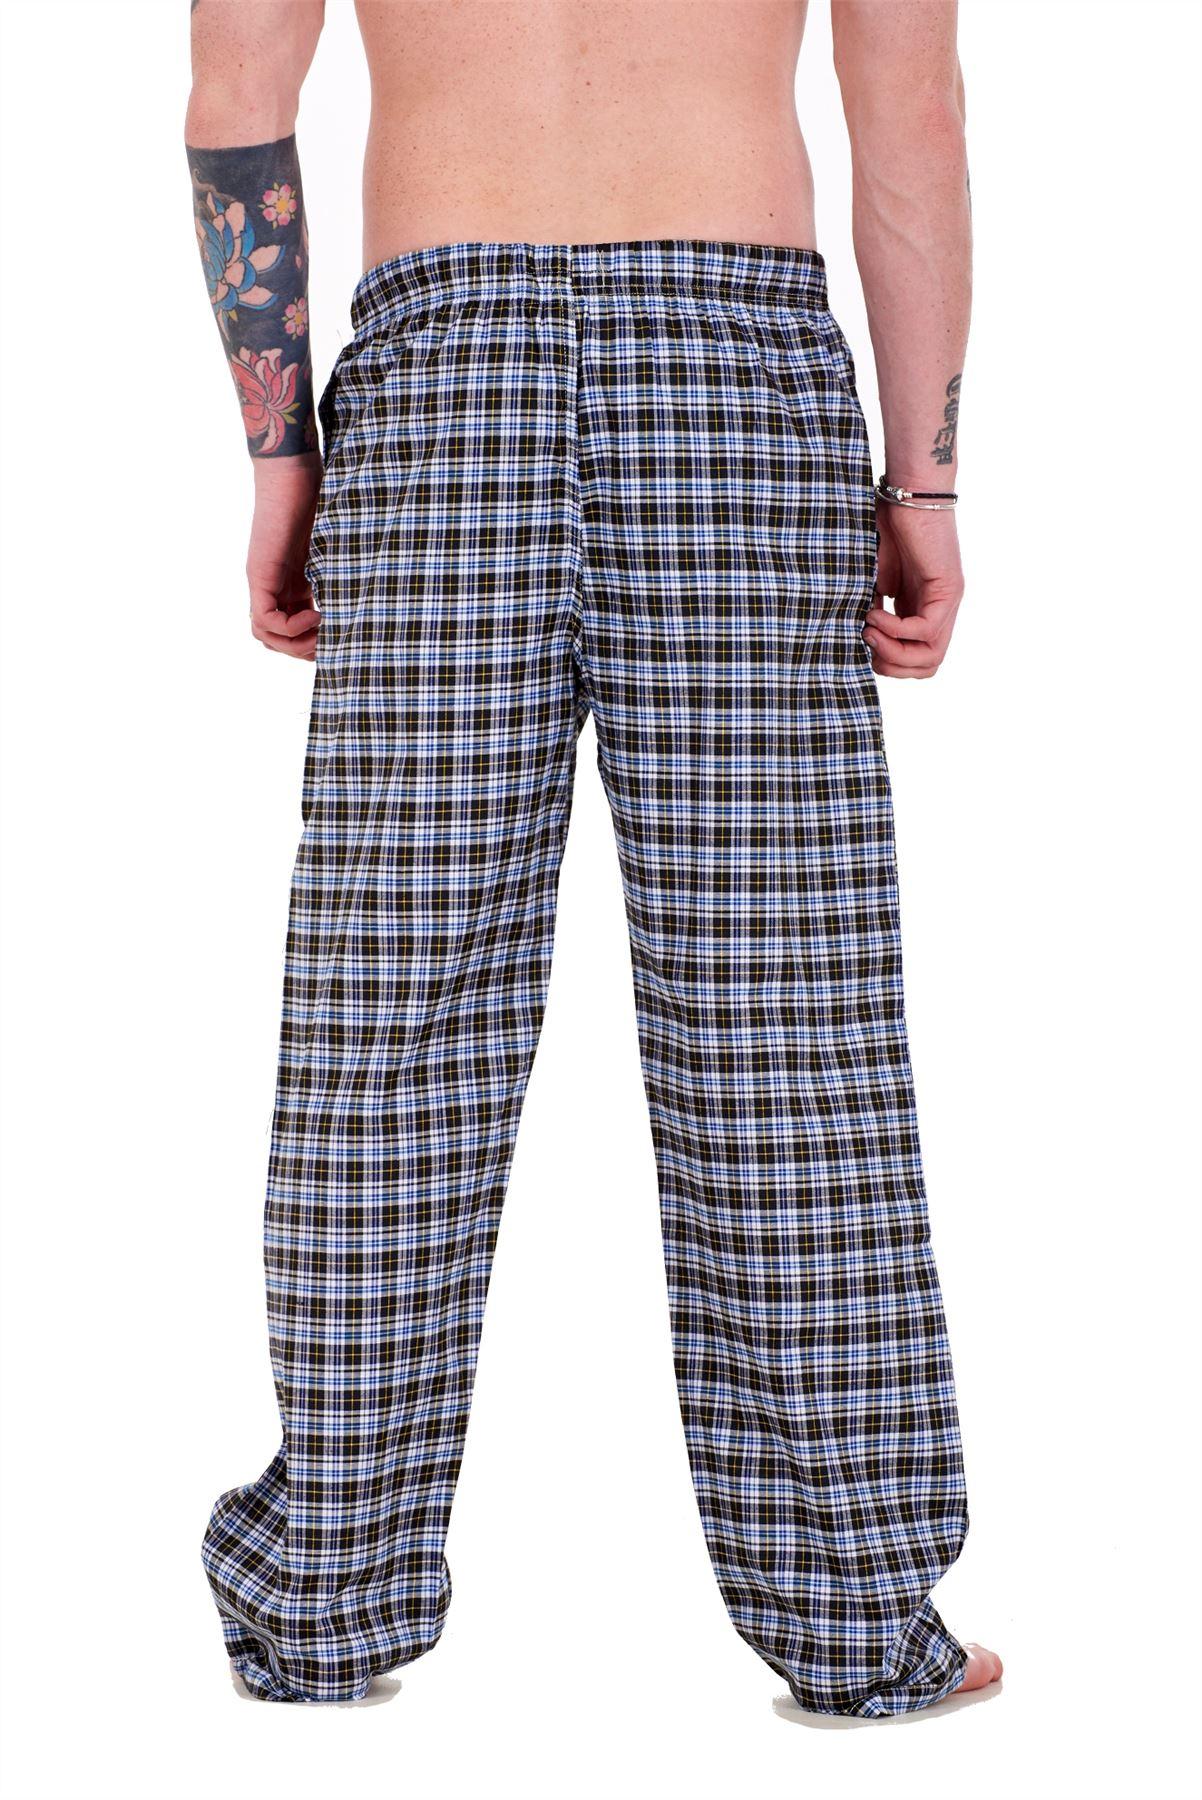 Mens-Pyjama-Bottoms-Rich-Cotton-Woven-Check-Lounge-Pant-Nightwear-Big-3XL-to-5XL Indexbild 6